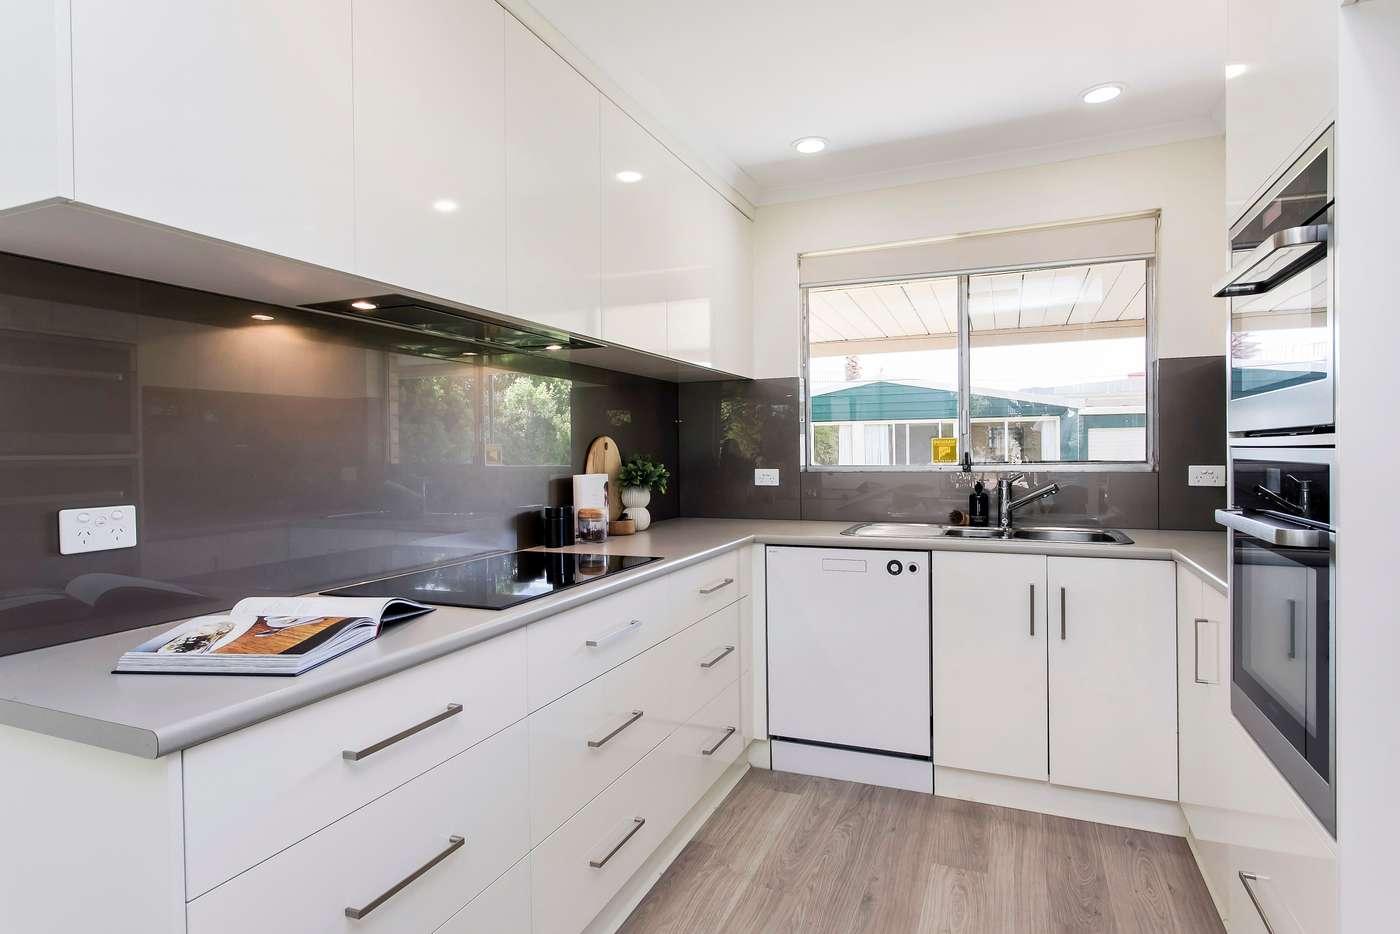 Sixth view of Homely house listing, 19 Wahratta Avenue, Morphett Vale SA 5162